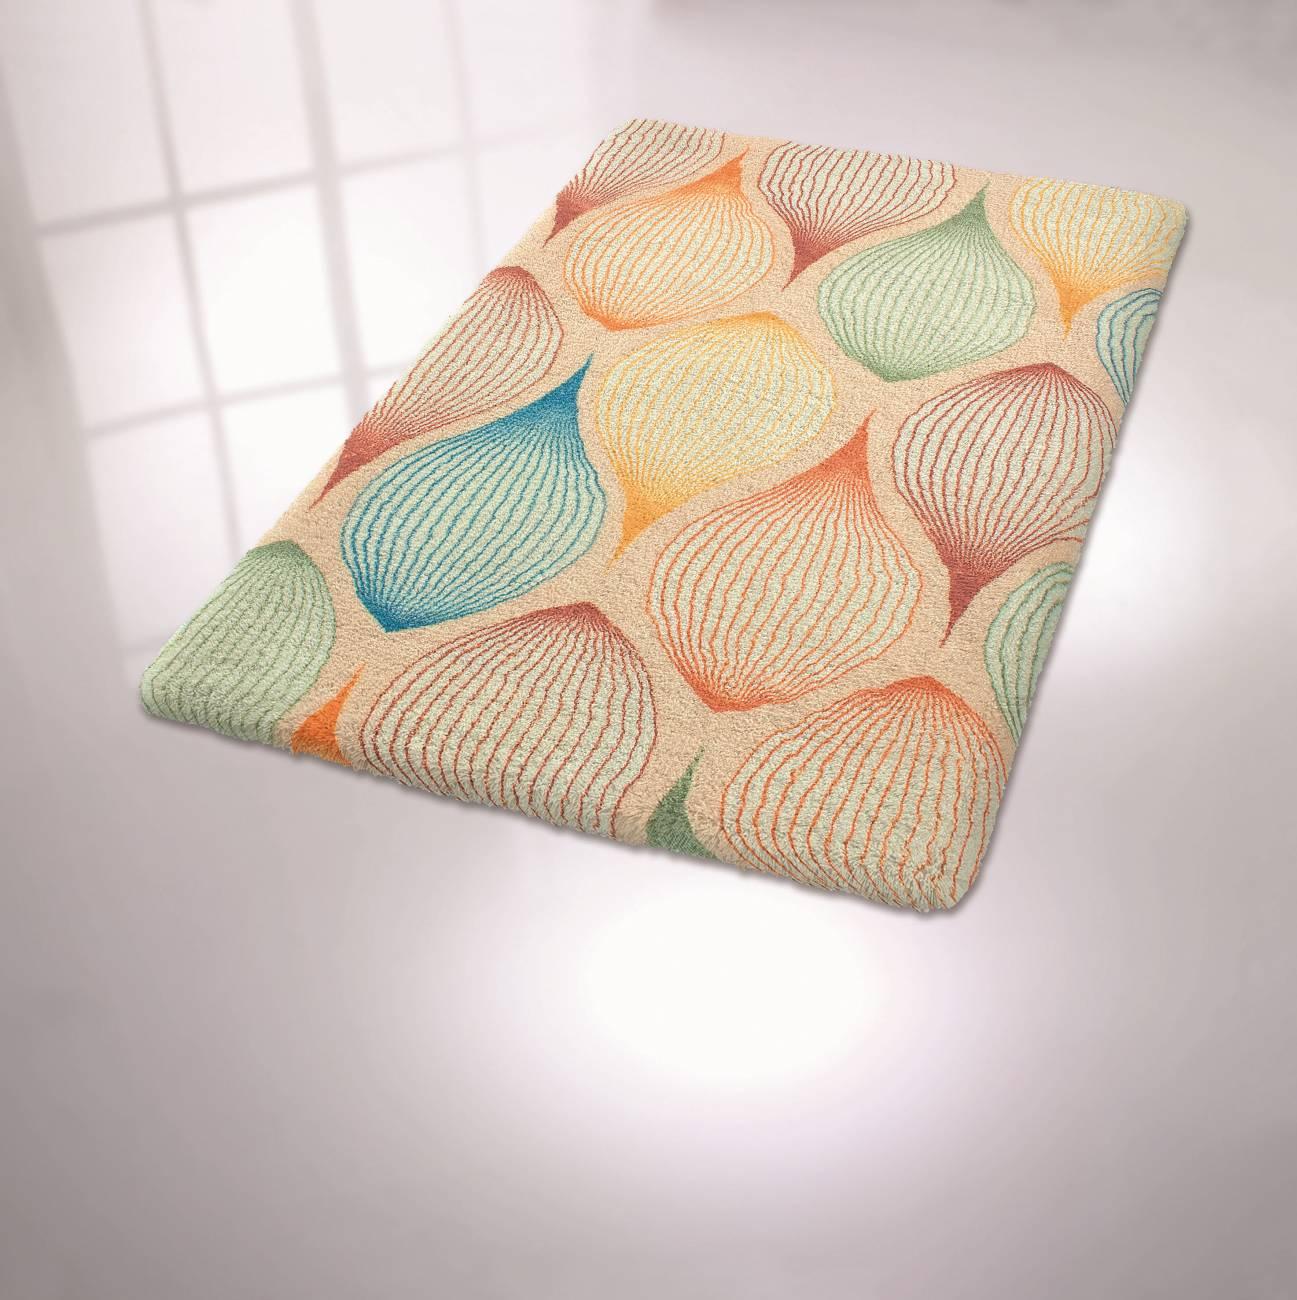 Badteppich Magic 100 % Polyester Multicolor